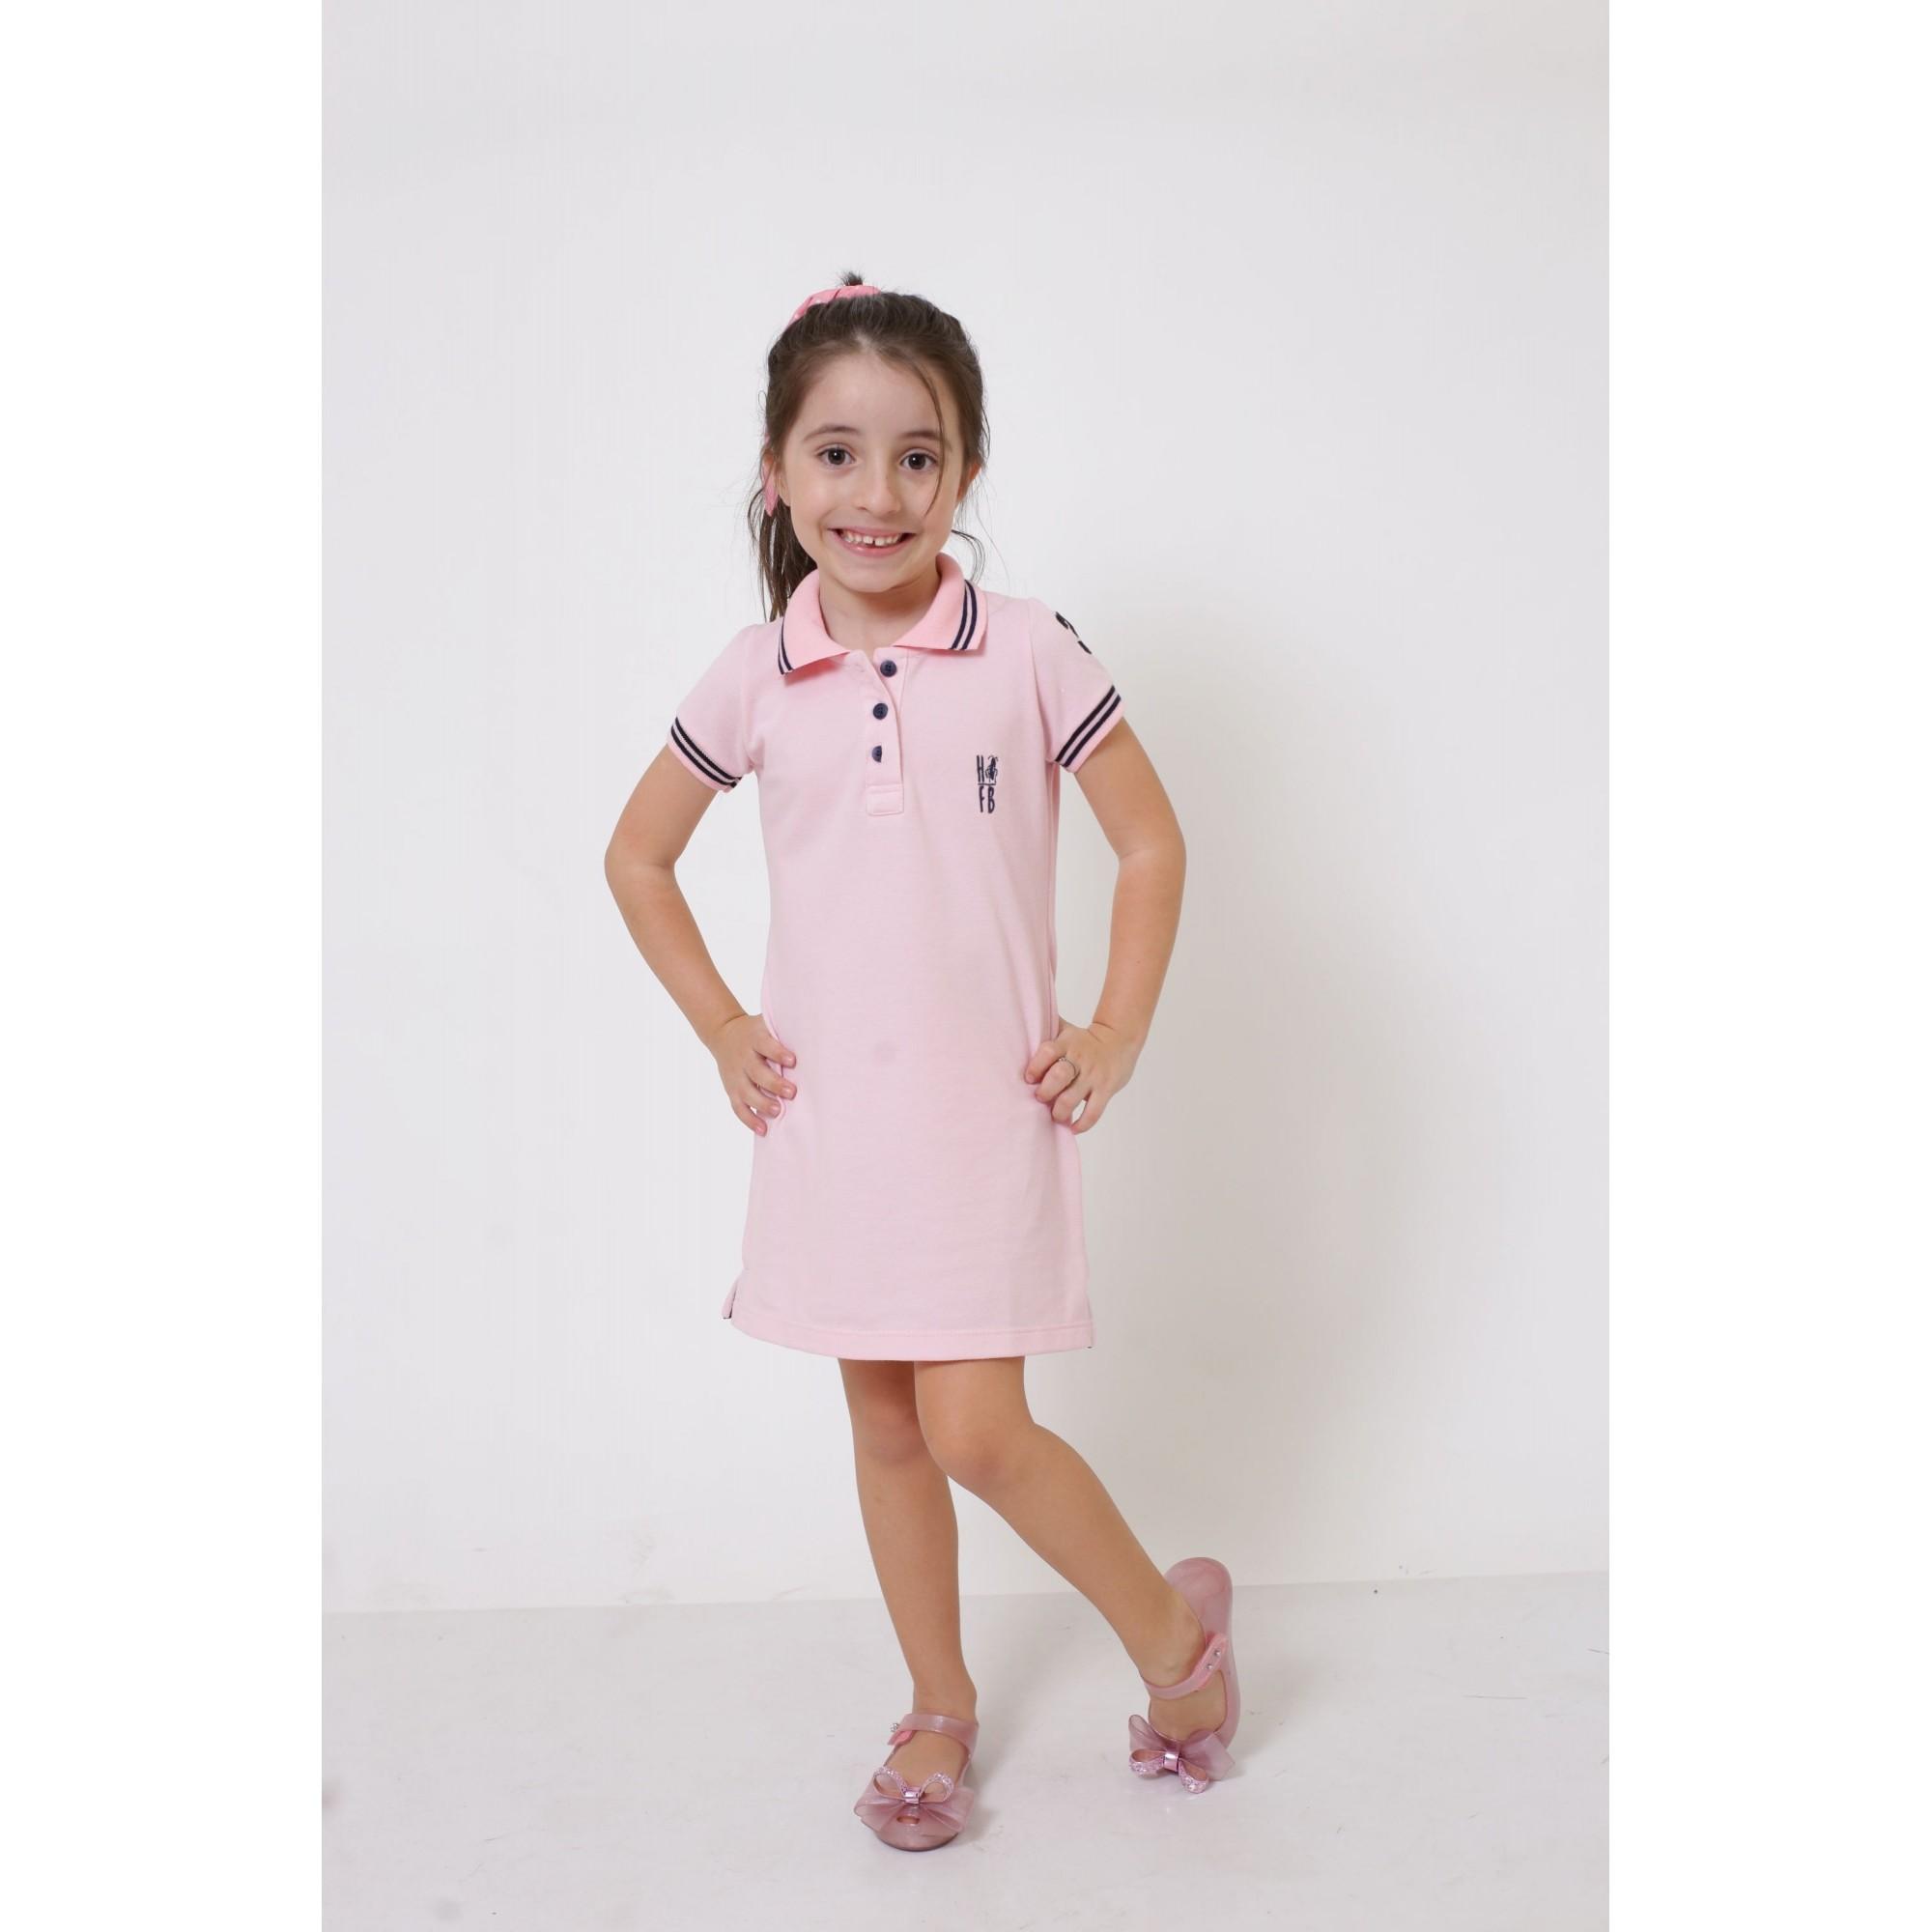 Vestido Polo Rosa Amor Infantil  - Heitor Fashion Brazil